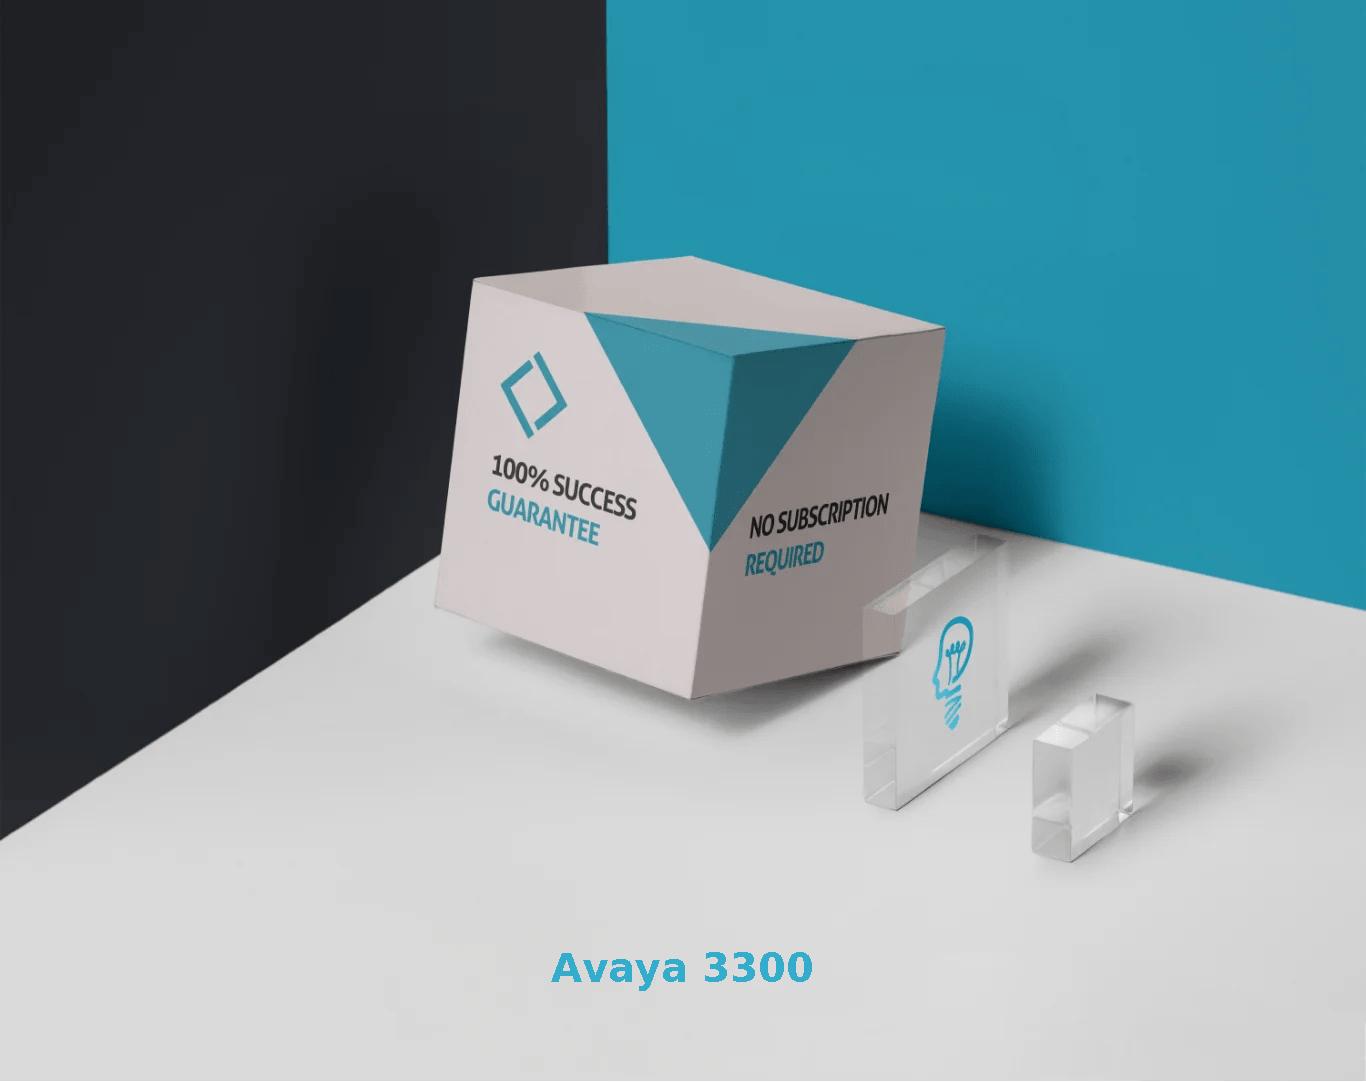 Avaya 3300 Exams